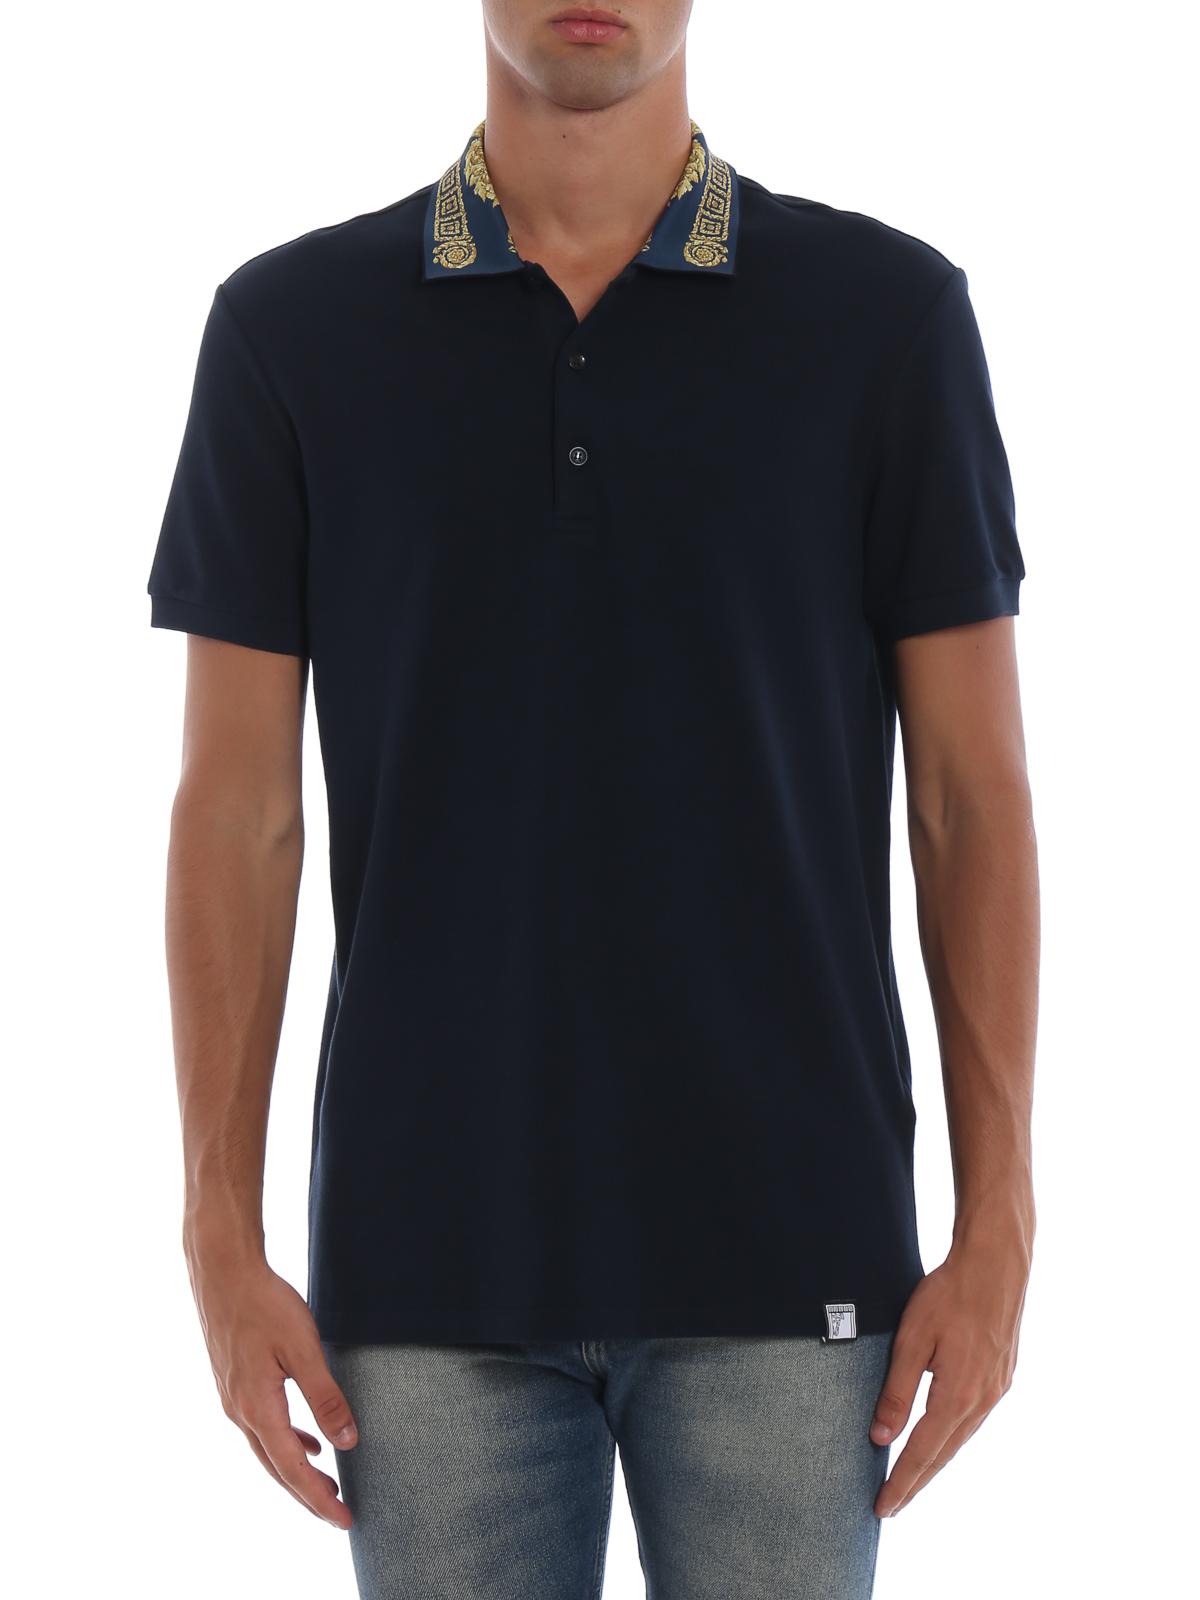 fc4b3f91e47 iKRIX VERSACE COLLECTION  polo shirts - Greek Key print collar blue polo  shirt